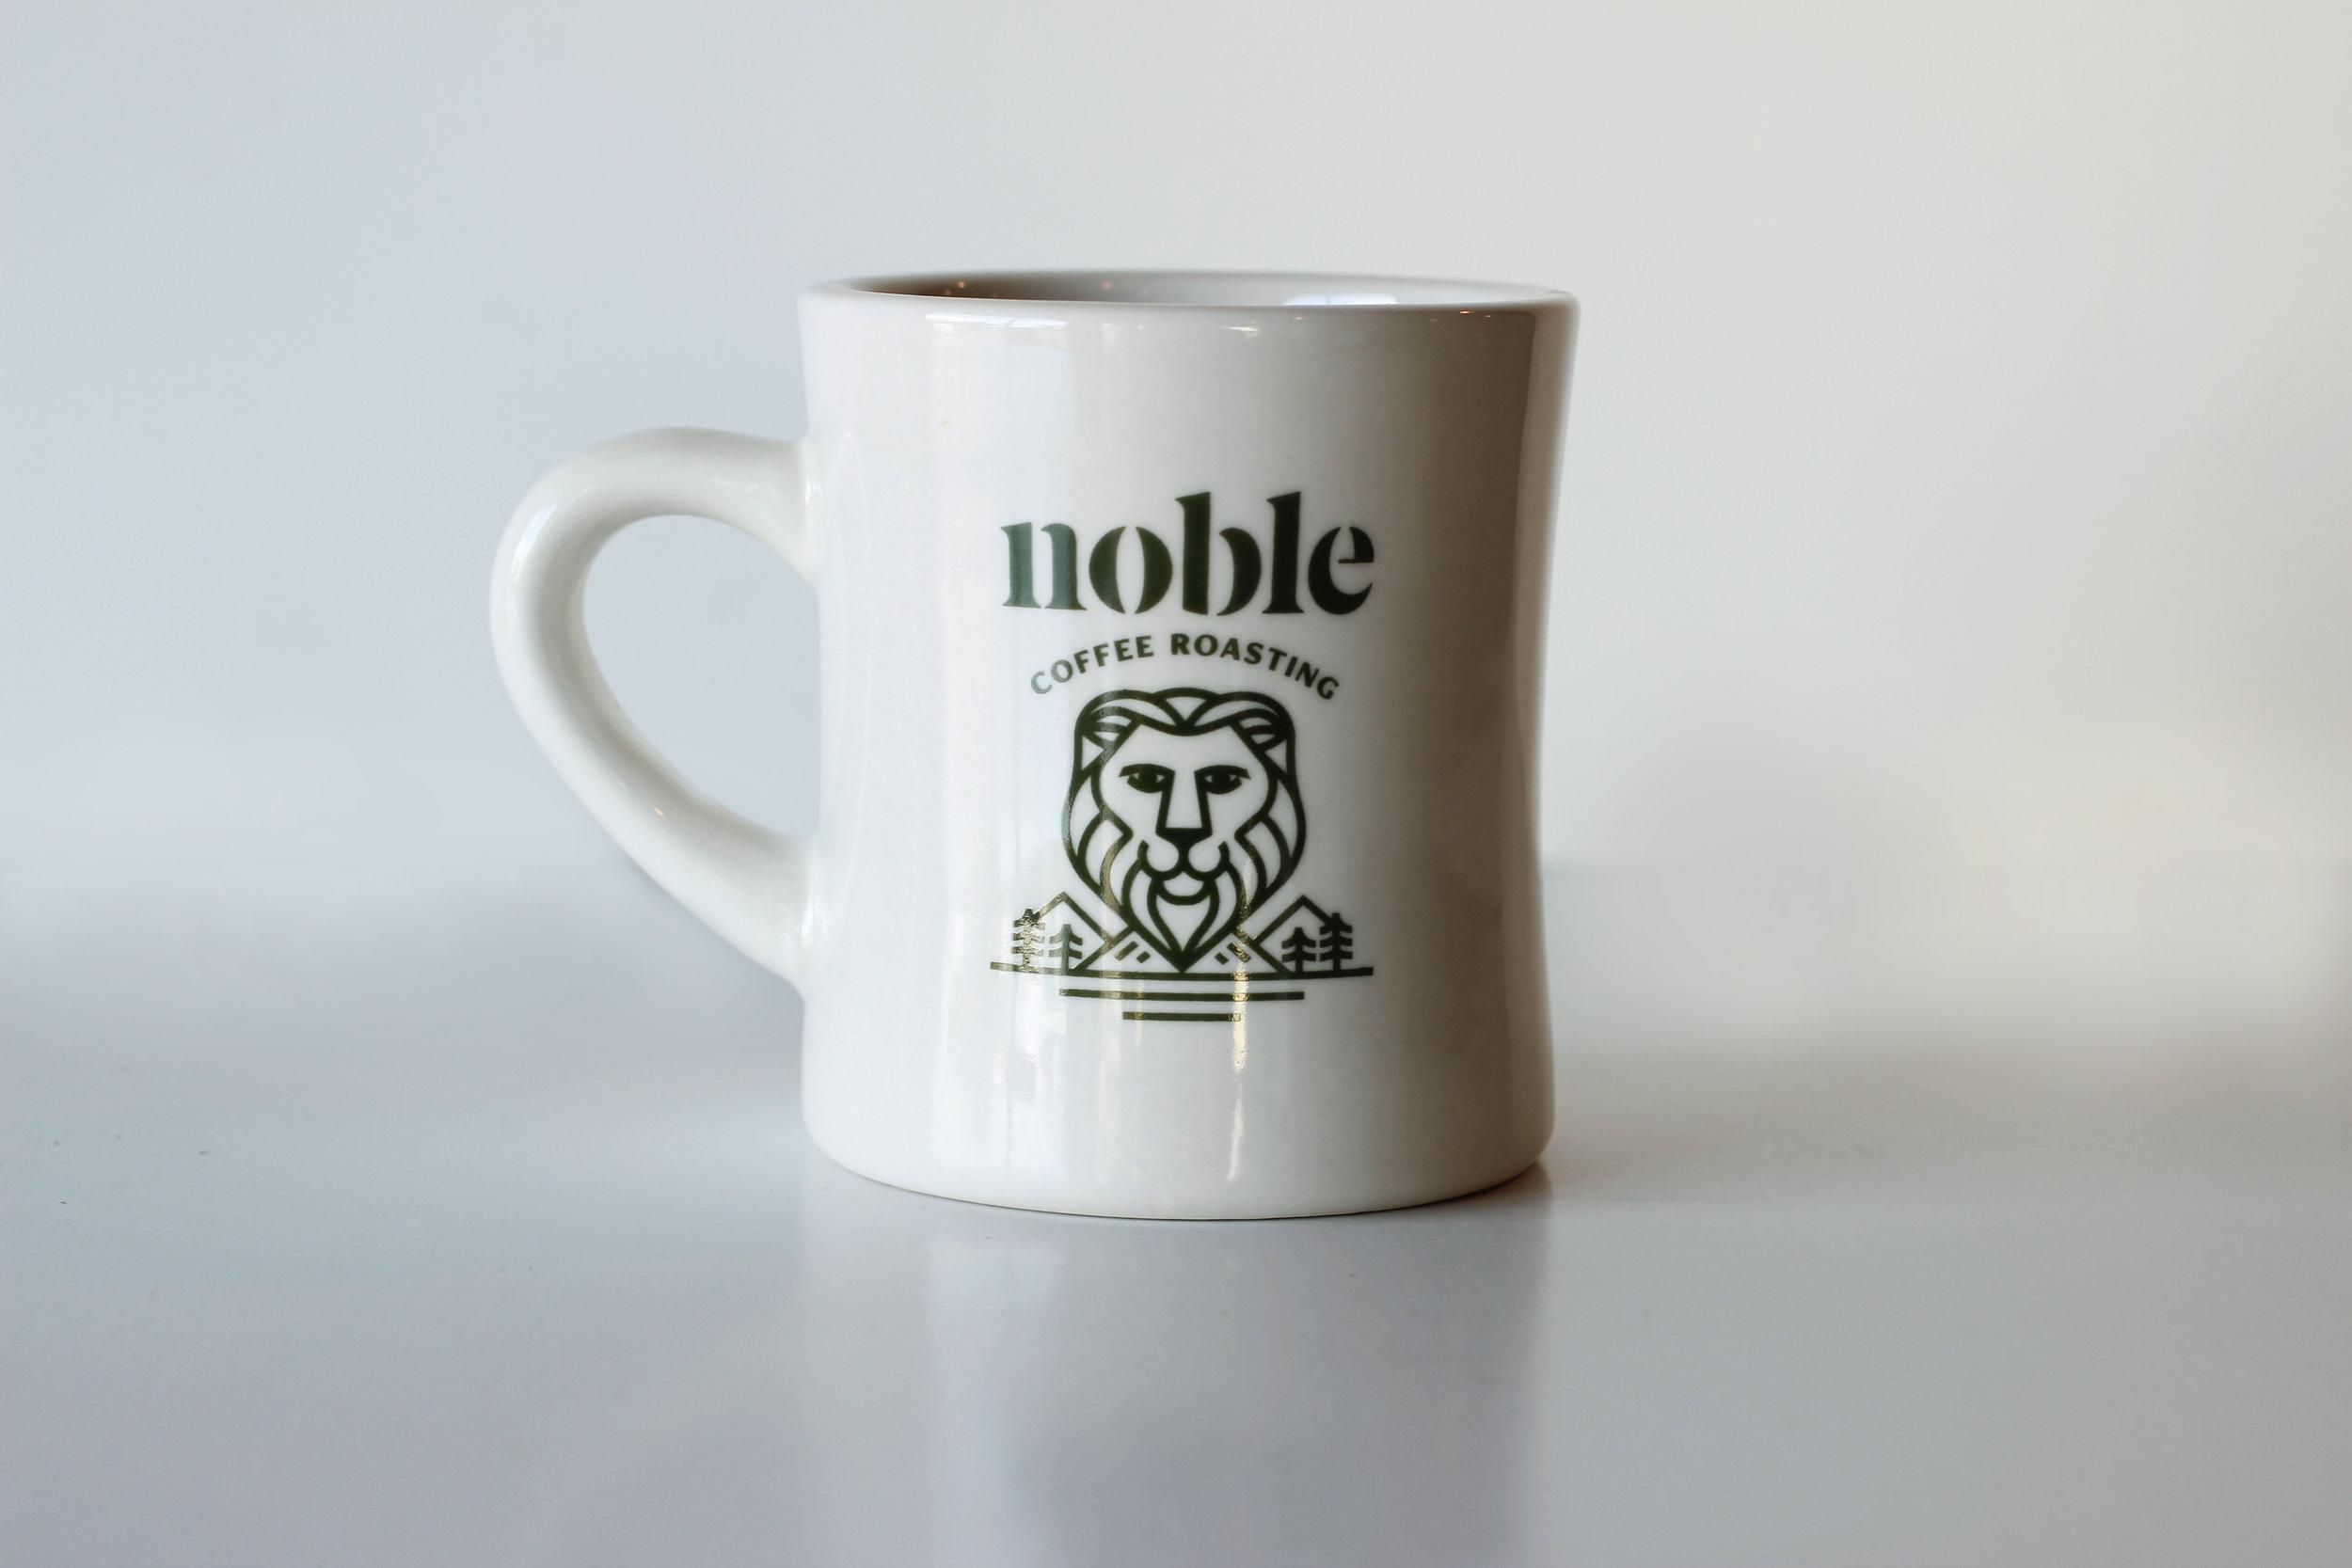 Mug — Roasting Noble Coffee Diner yPNwOvnm80